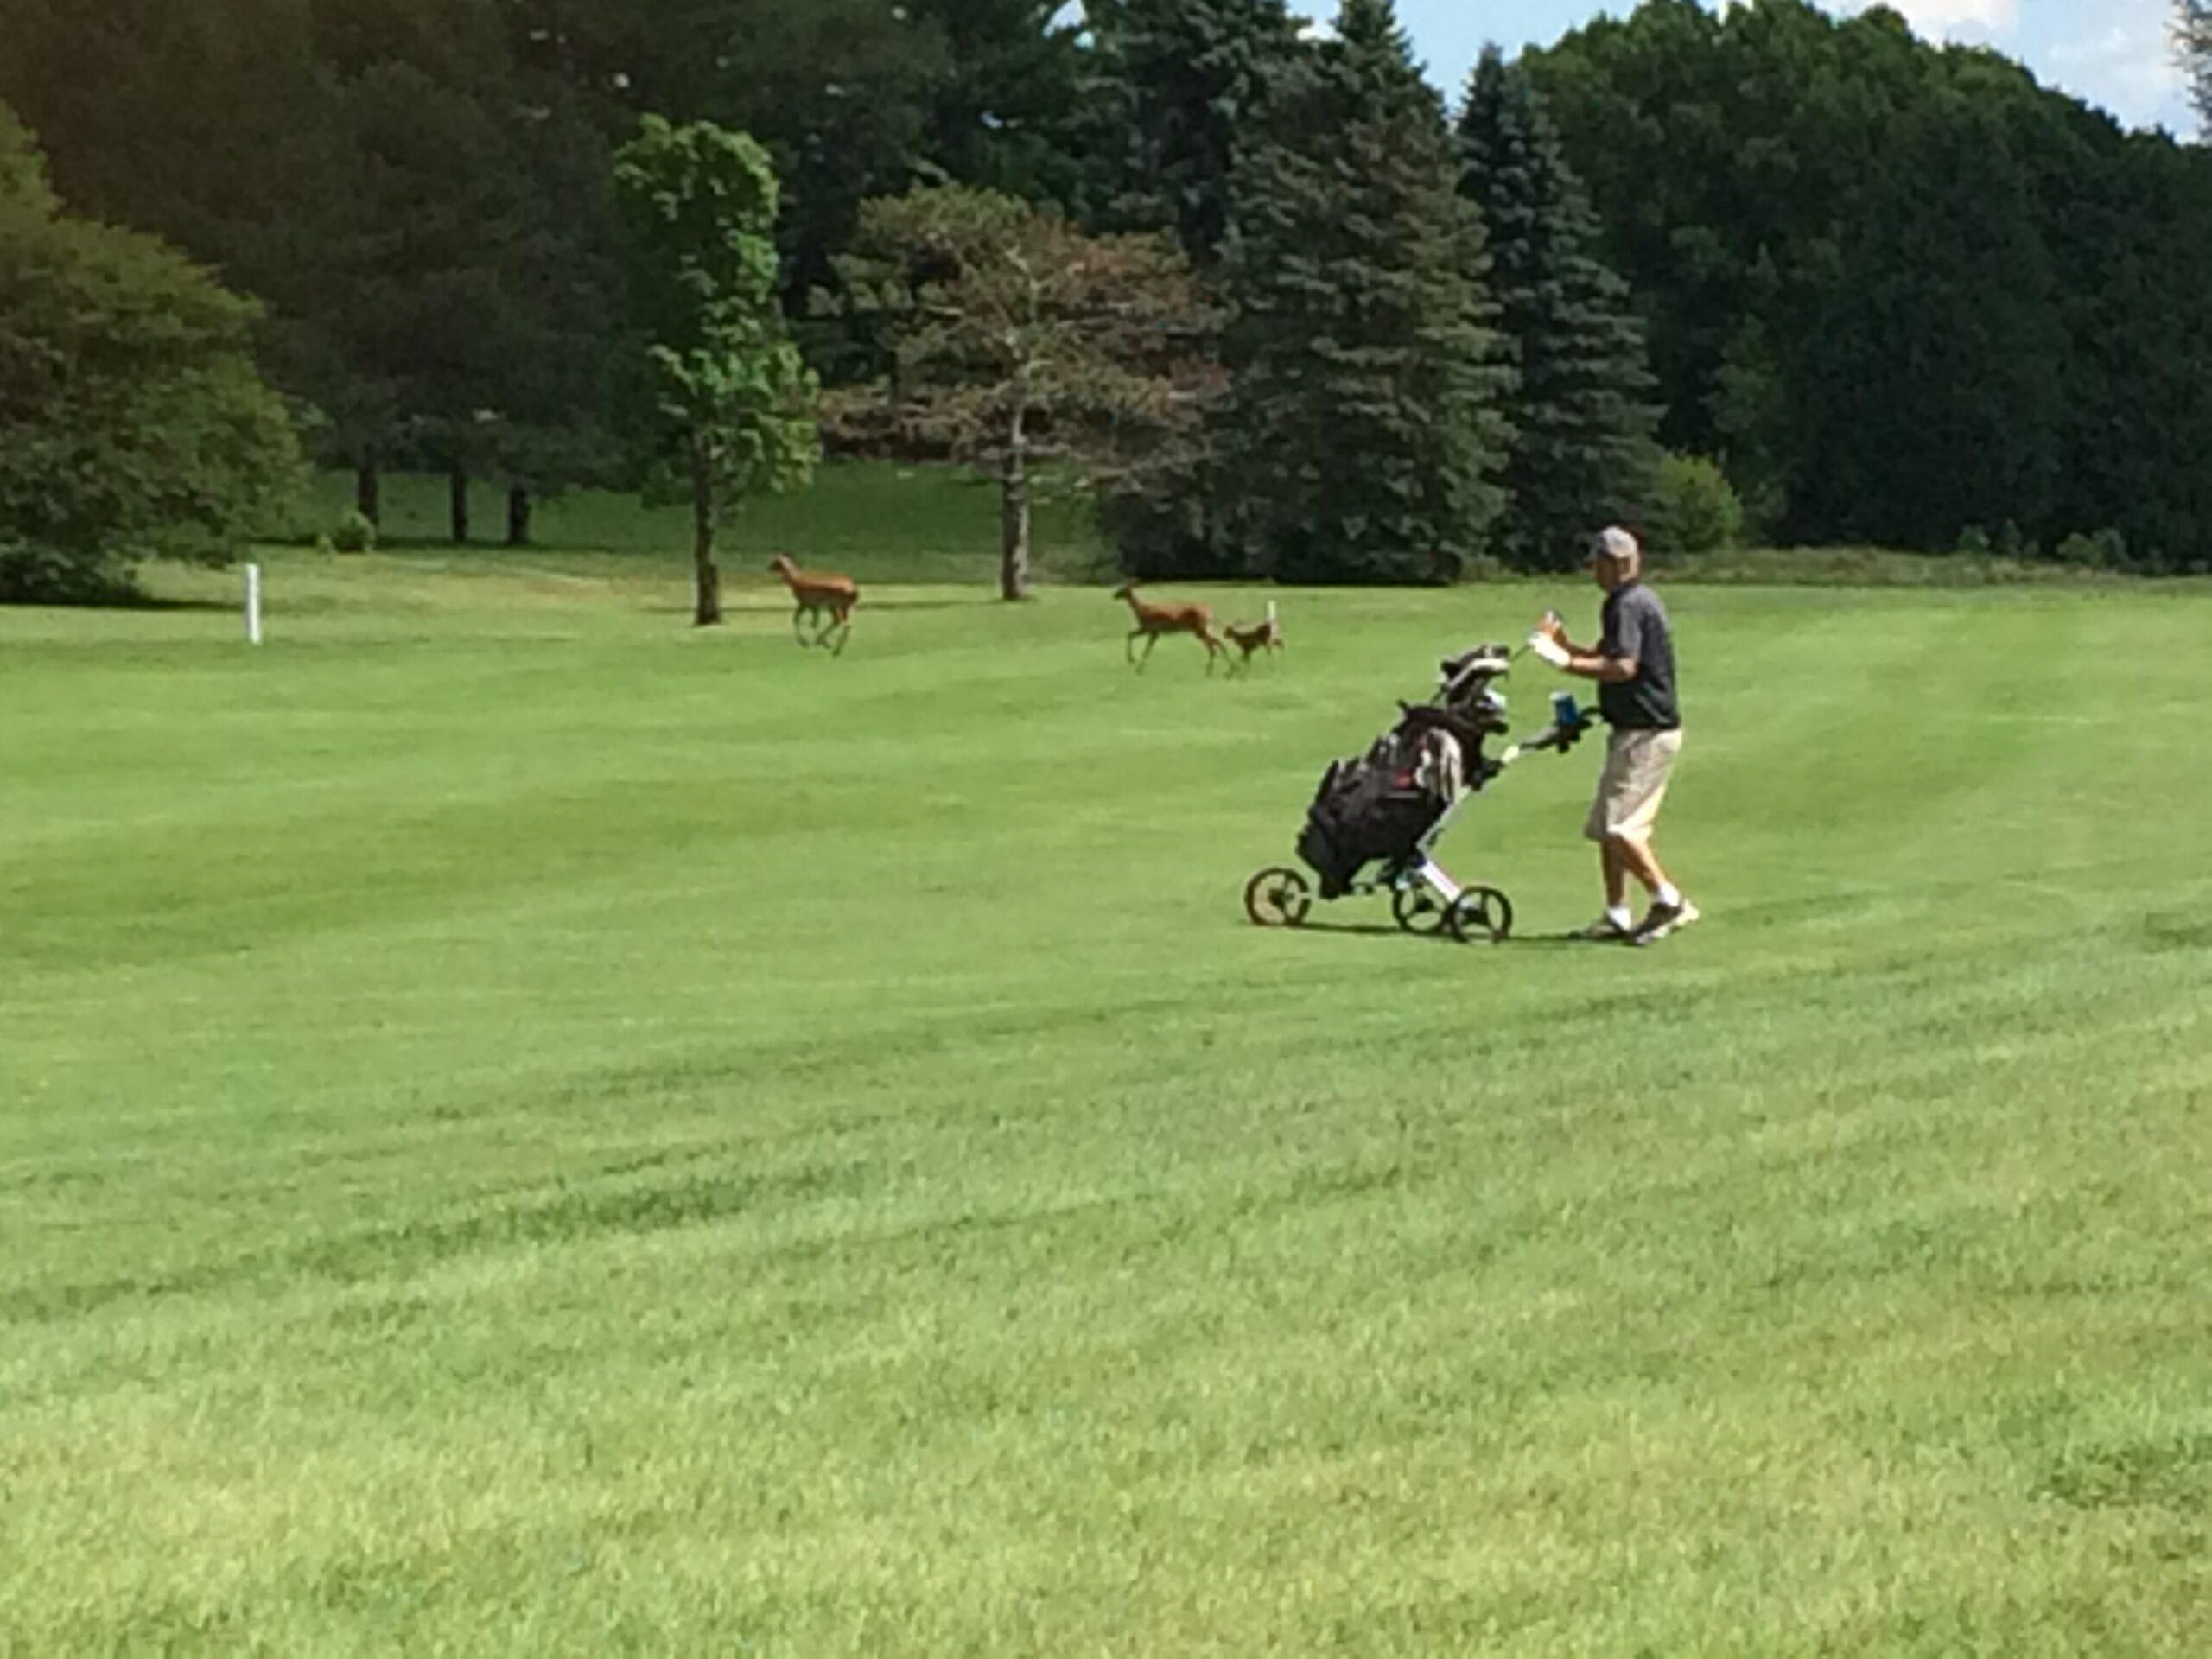 Golfer and deer